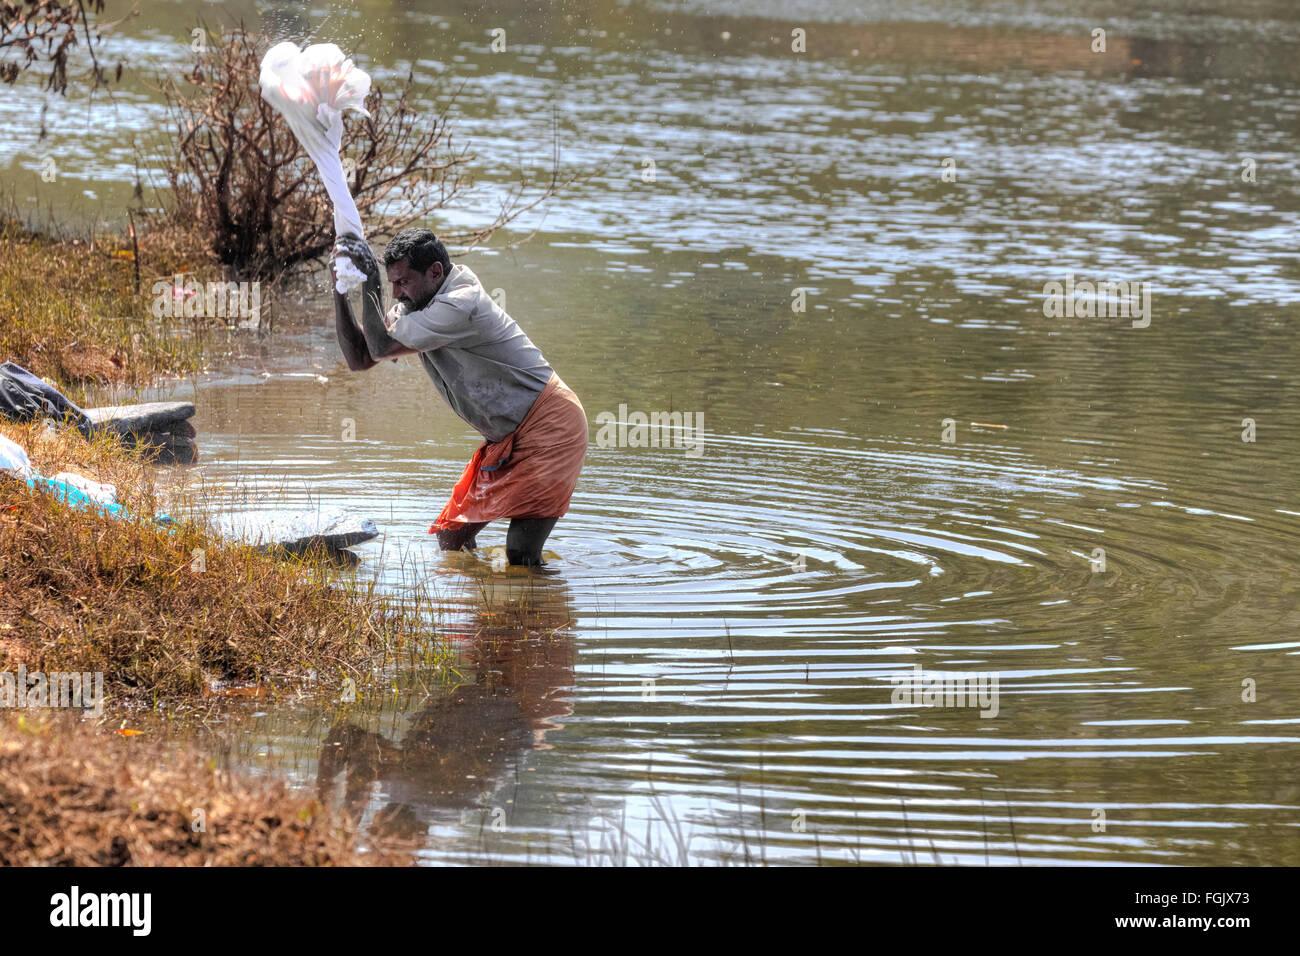 Jour de lessive dans la rivière de Periyar, Thekkady, Kerala, Inde Photo Stock